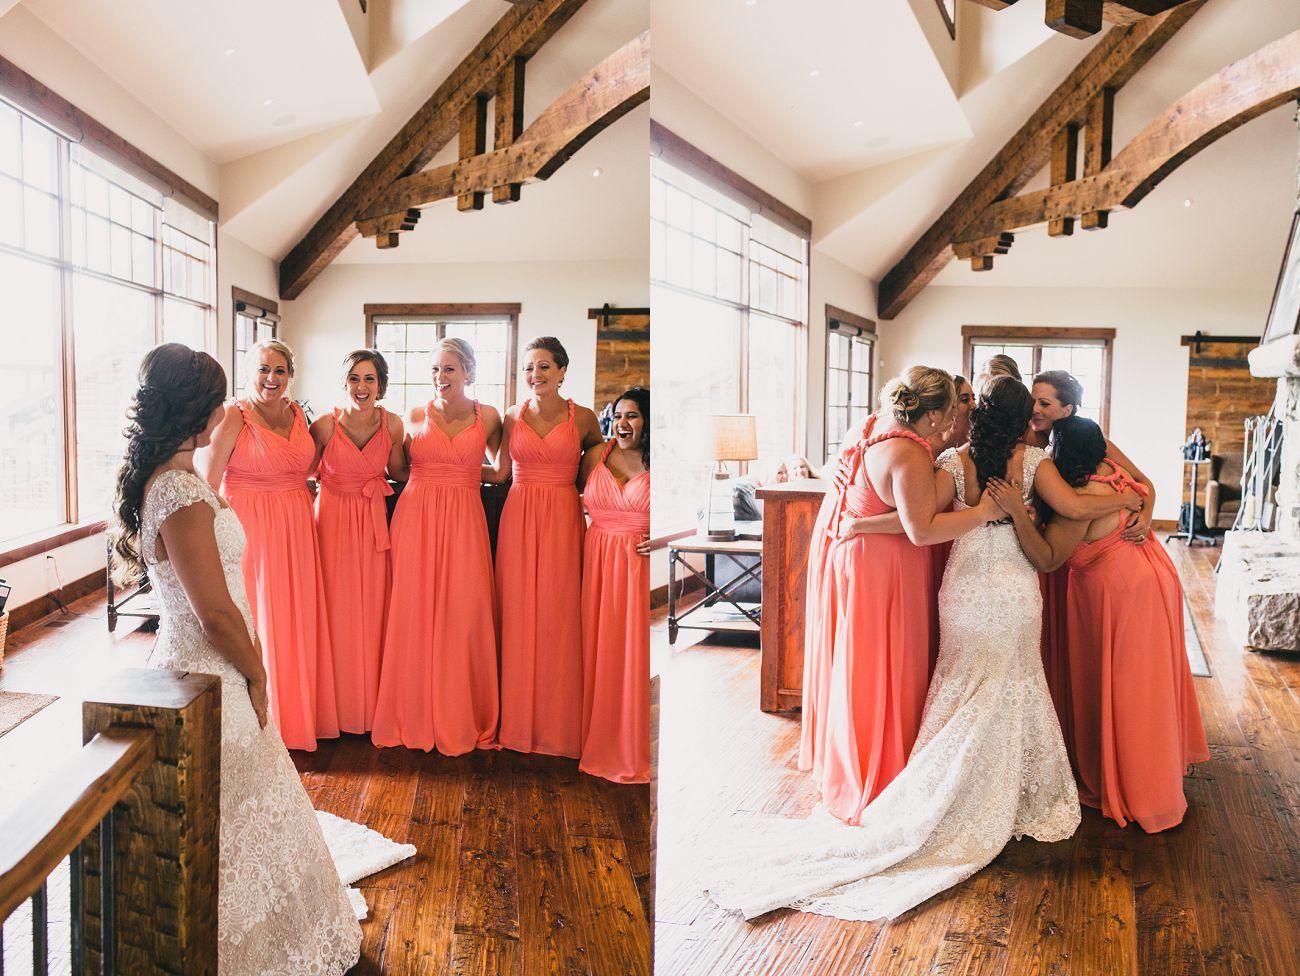 Jennifer_Mooney_Photo_Whitefish_Mountain_Resort_Wedding_00039.jpg